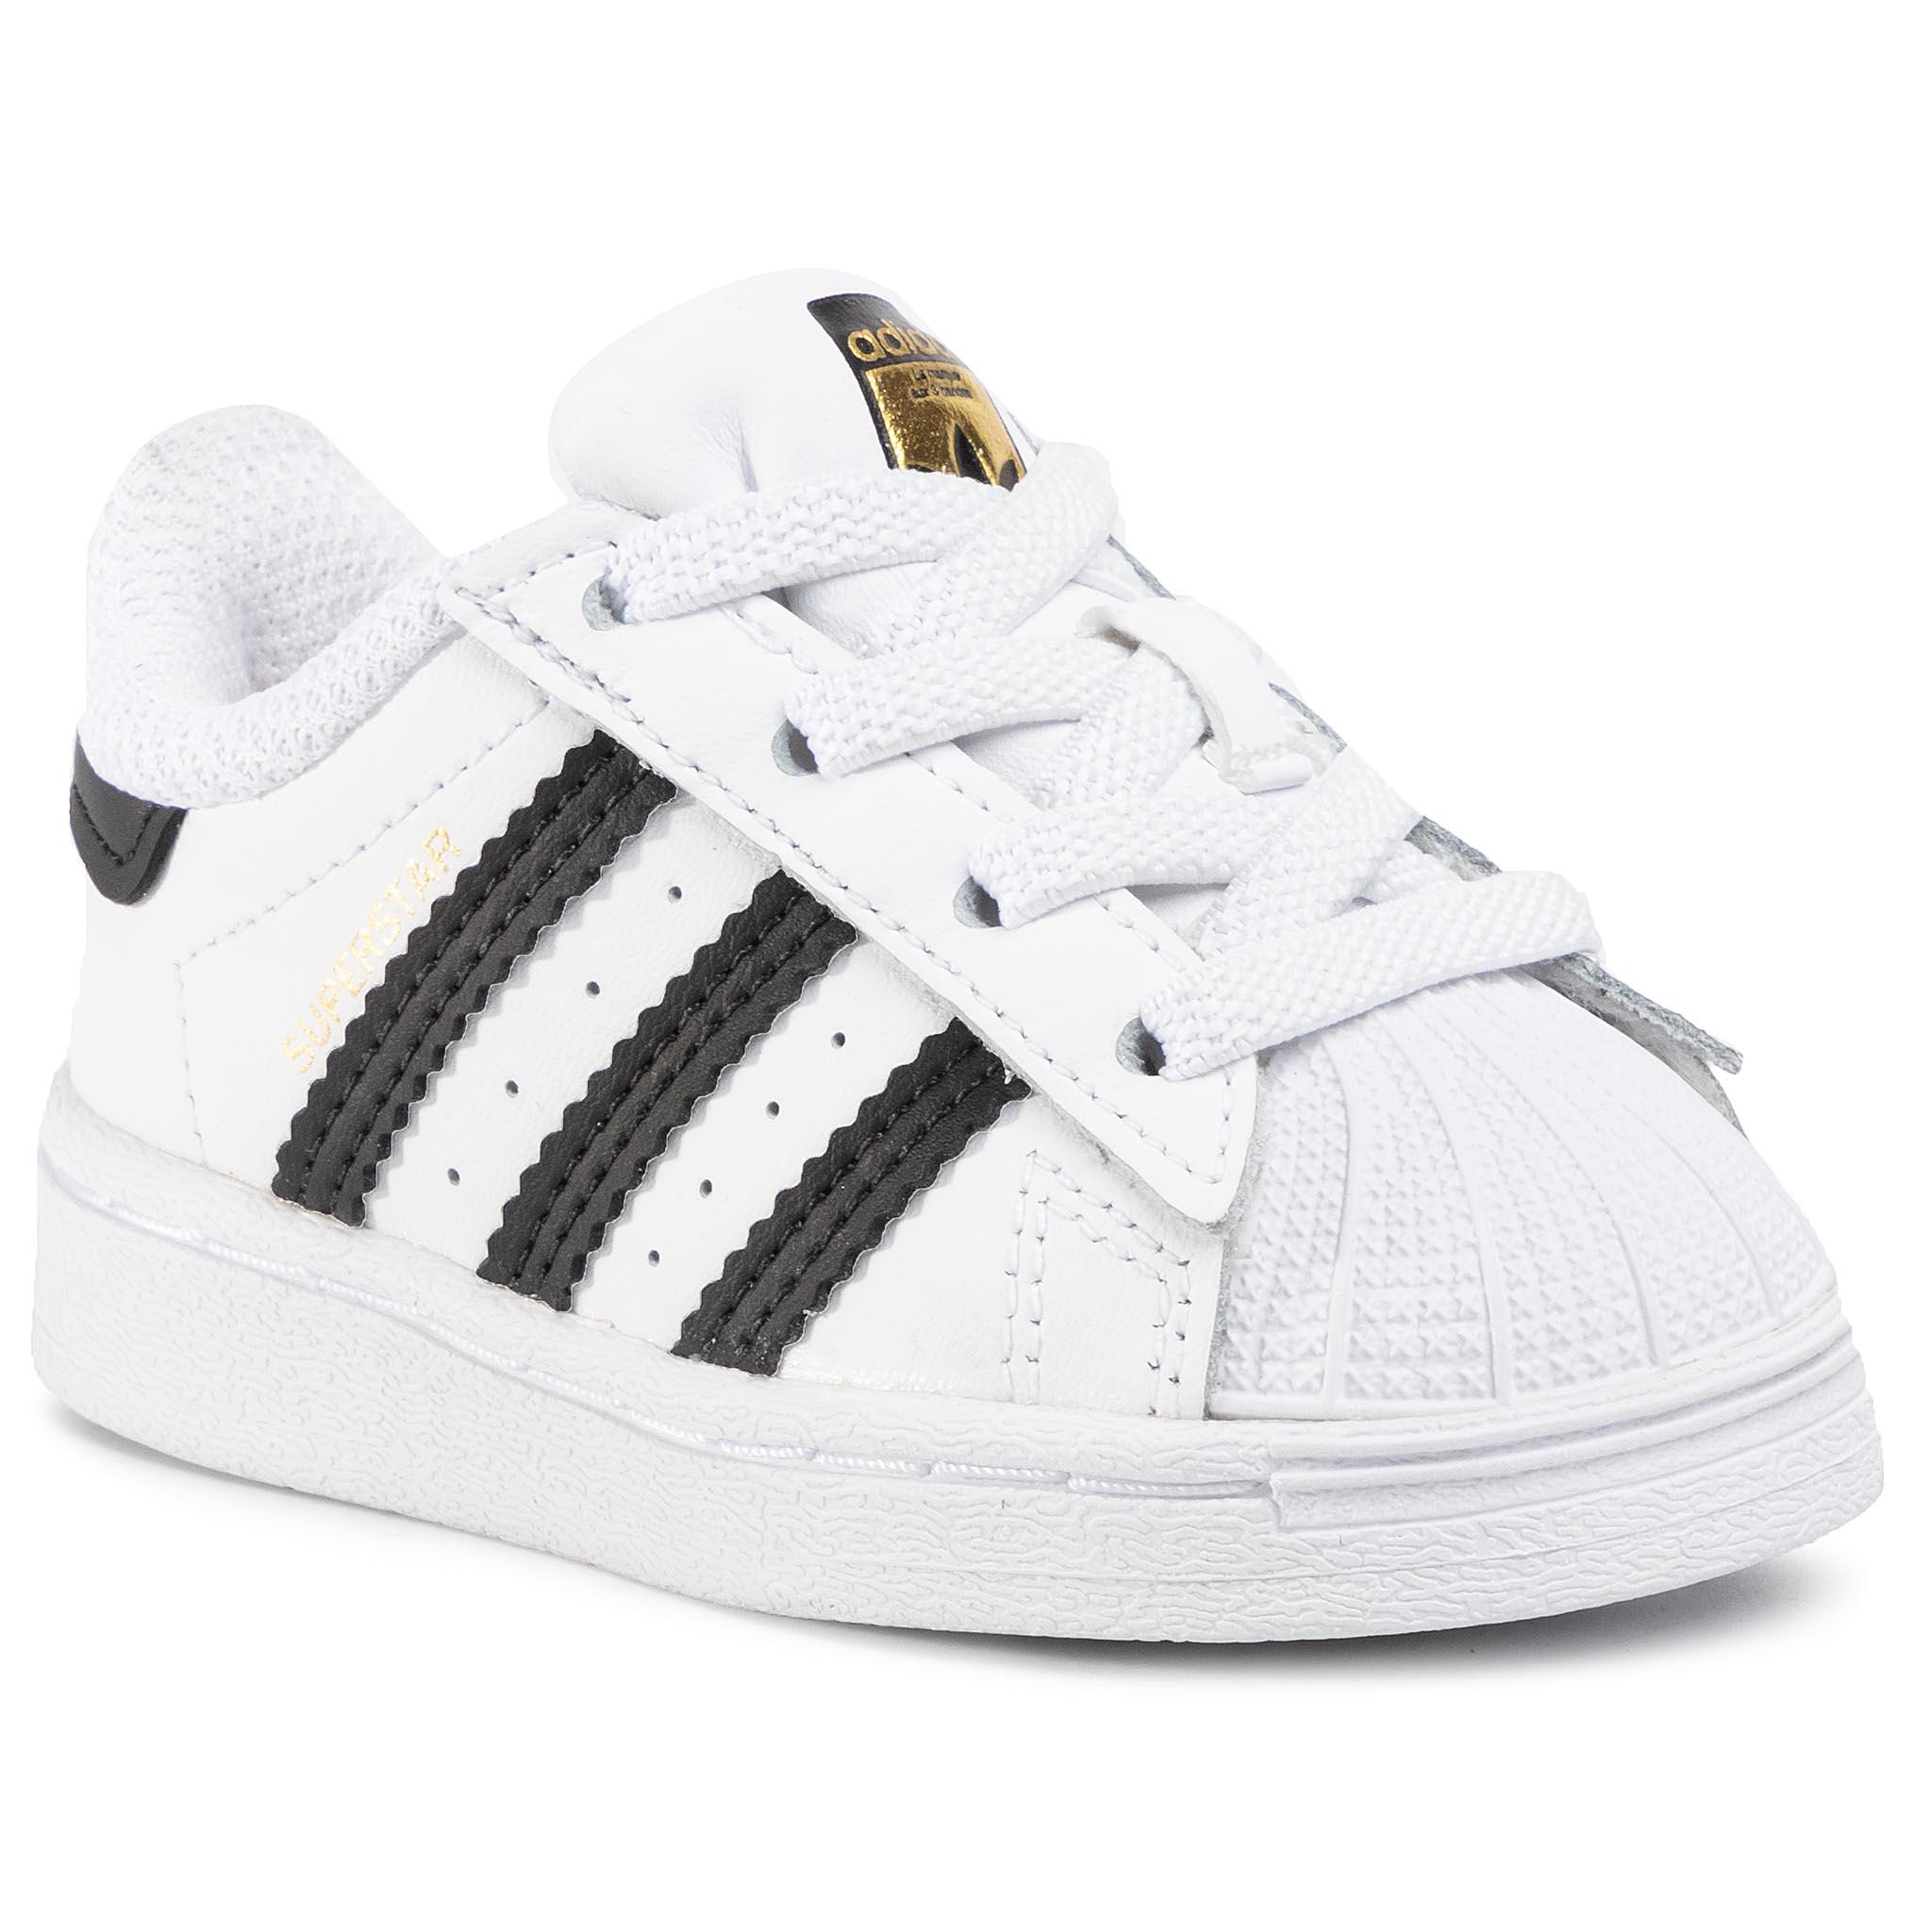 Cipő adidas Superstar El I FU7717 FtwwhtCblackFtwwht